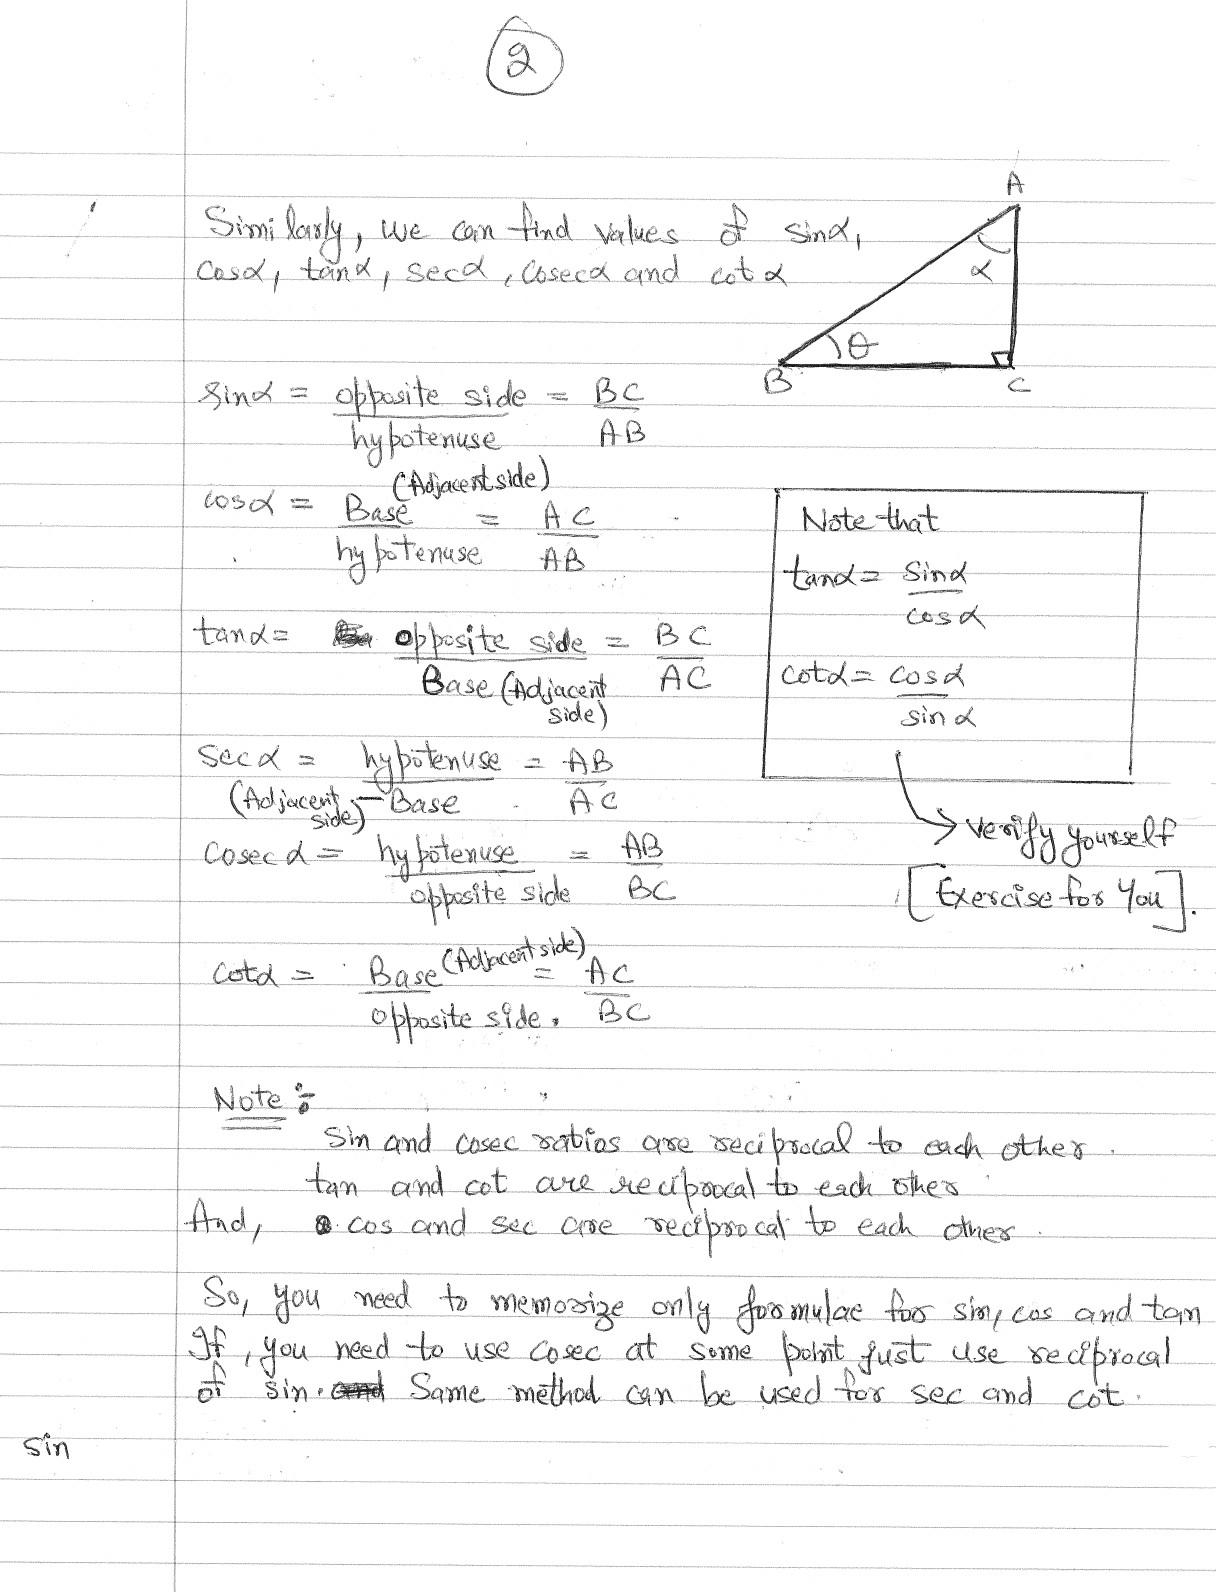 Worksheet trigonometric ratios gabrieltoz worksheets for for Trigonometric ratios table 0 360